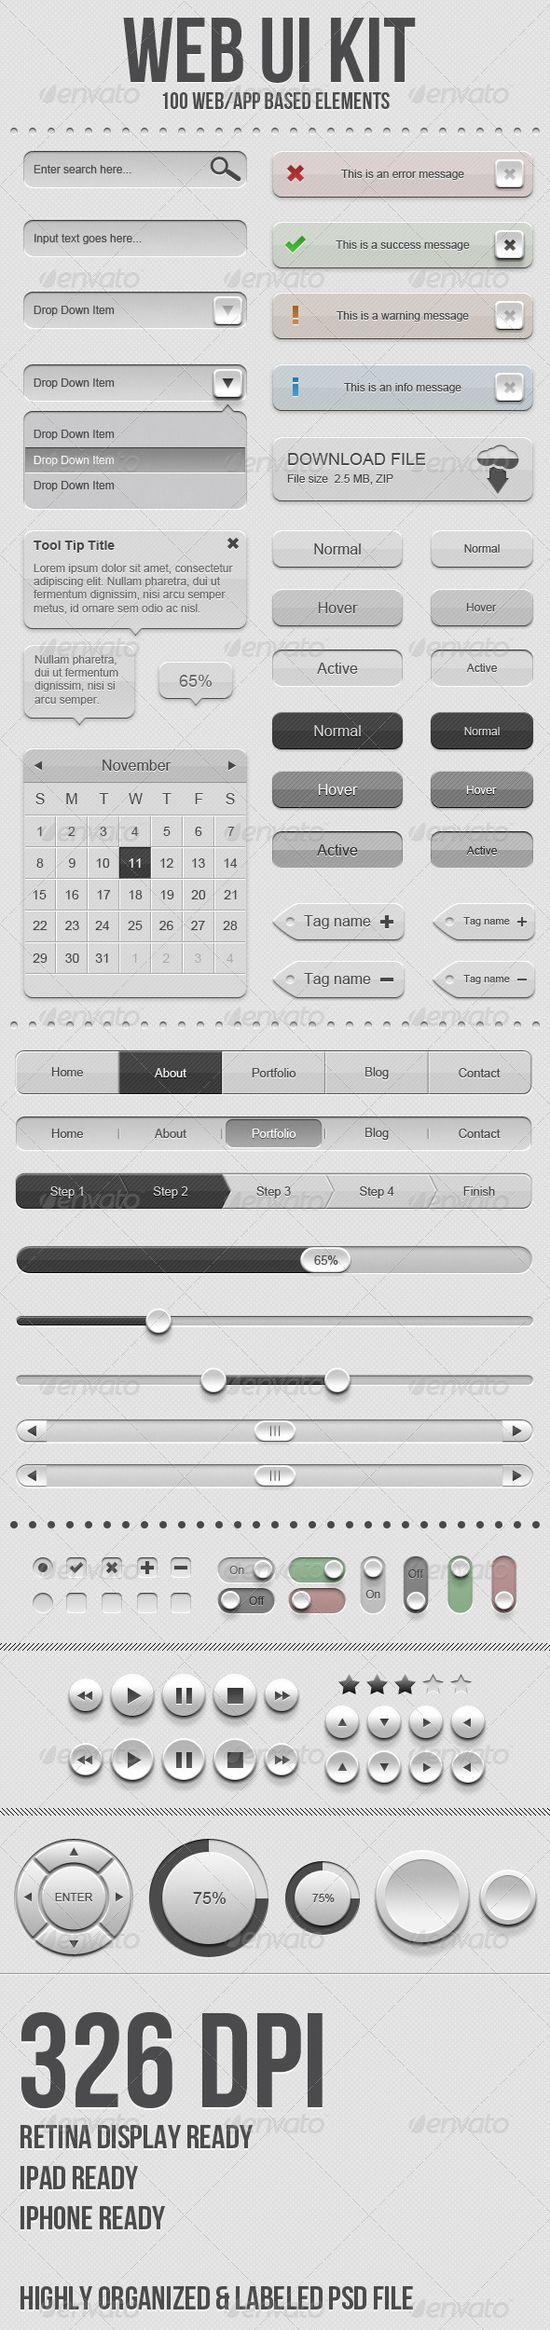 [ UI Kit ] Web UI Kit